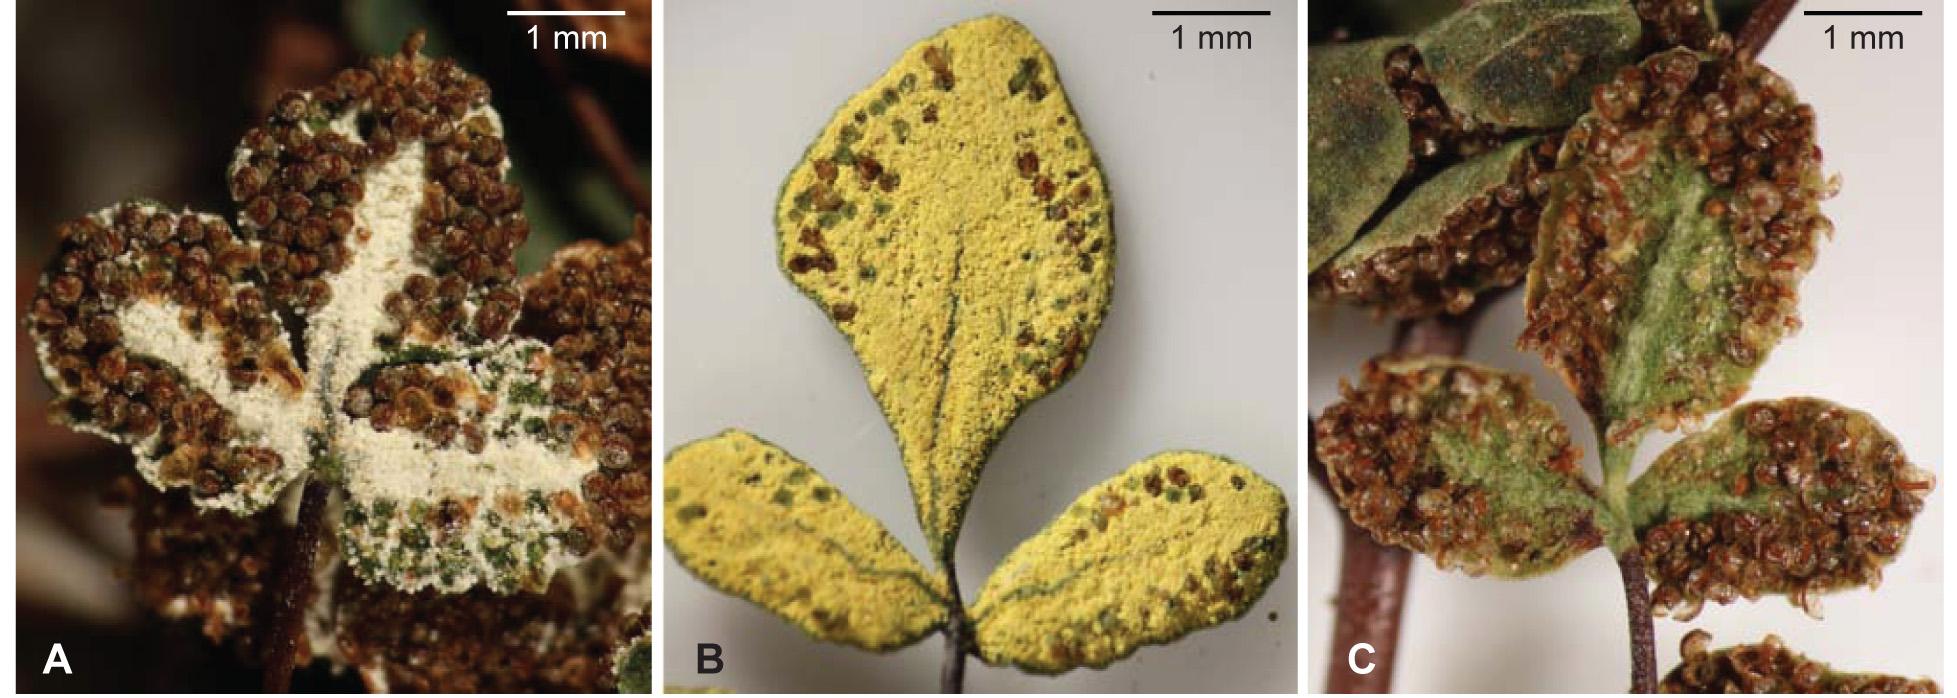 Three varieties of  Argyrochosma nivea . A. A. nivea var. nivea with white farina. B. A. nivea var. flava  with yellow farina. C. A. nivea var. tenera  without farina. (Image from Sigel  et al. 2011,  Systematic Botany )